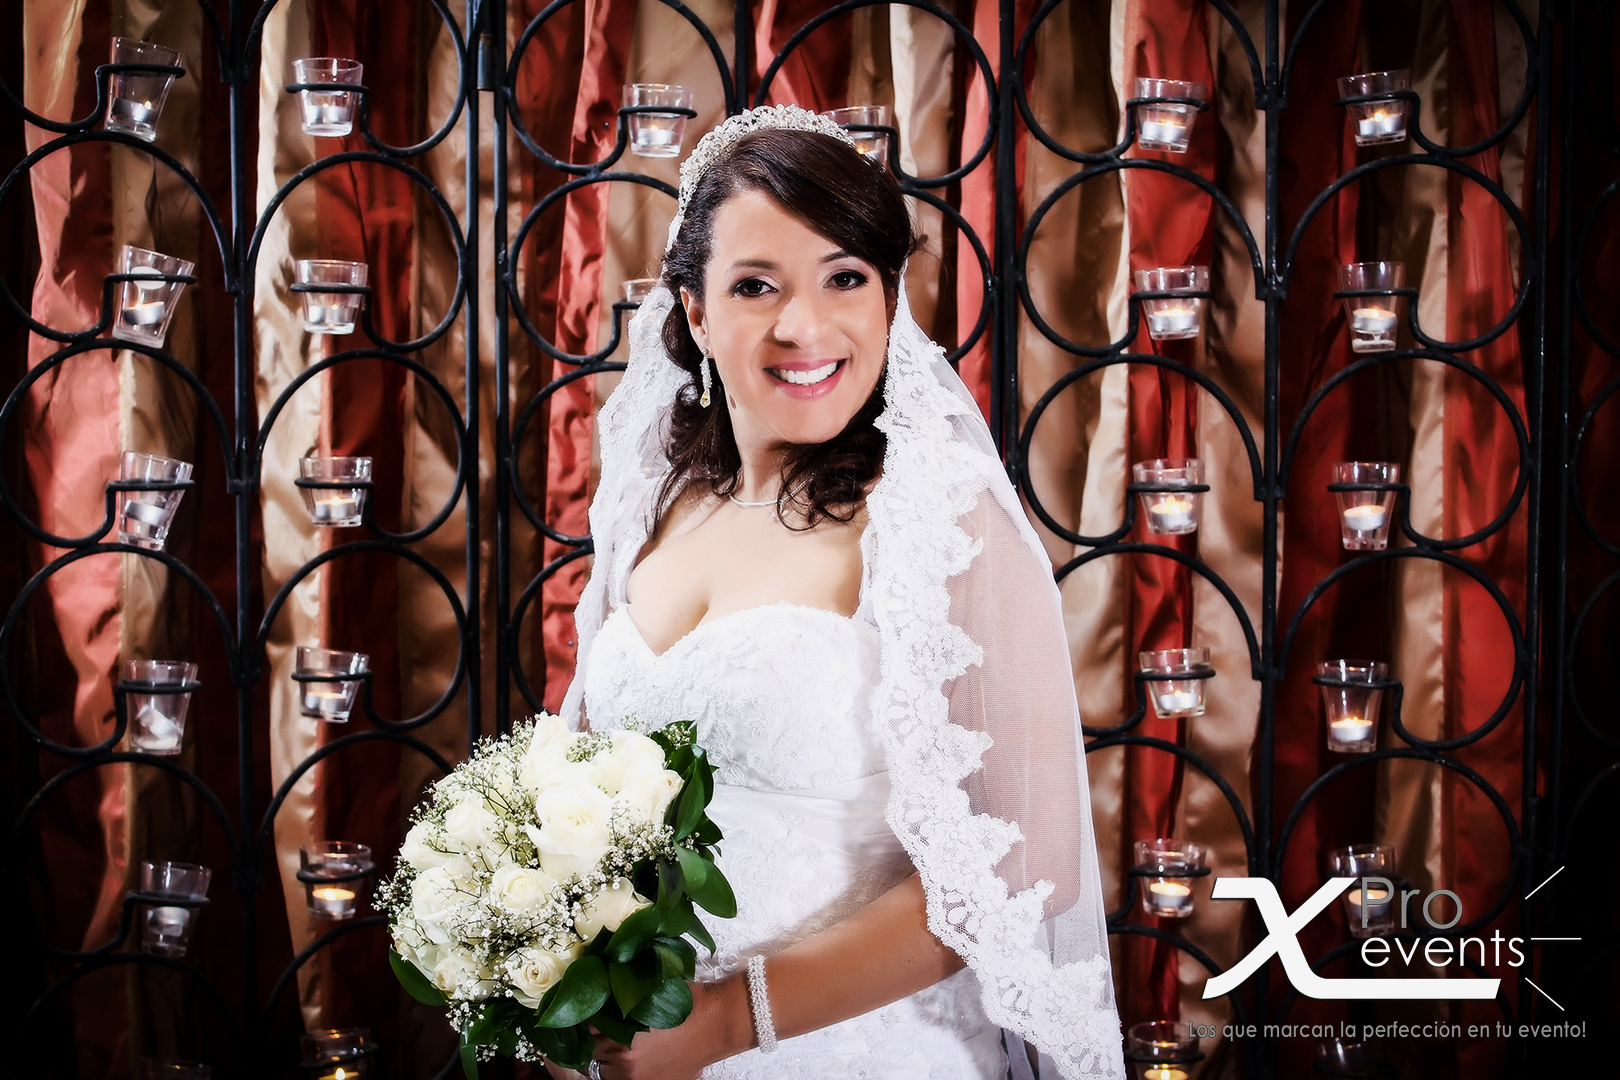 www.Xproevents.com - Novia Ruth Santos en el Hotel Hilton 2